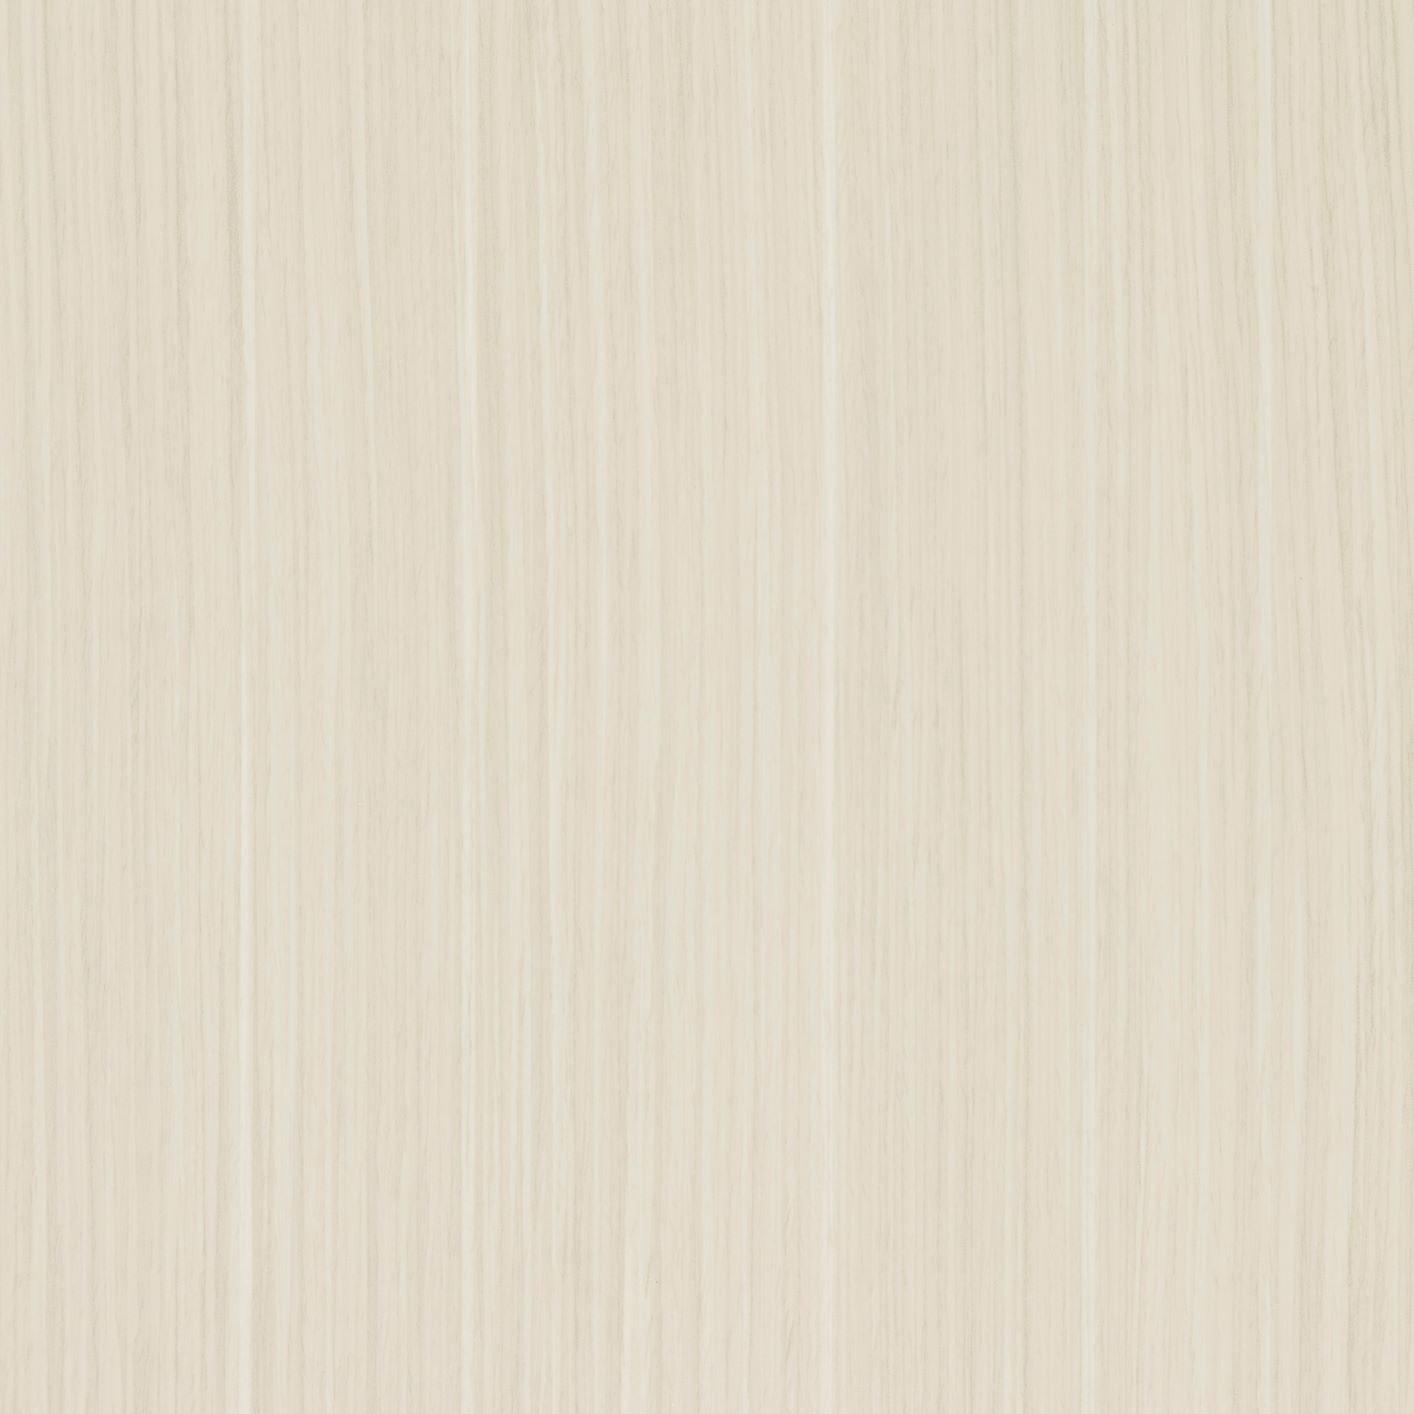 02-Bianco